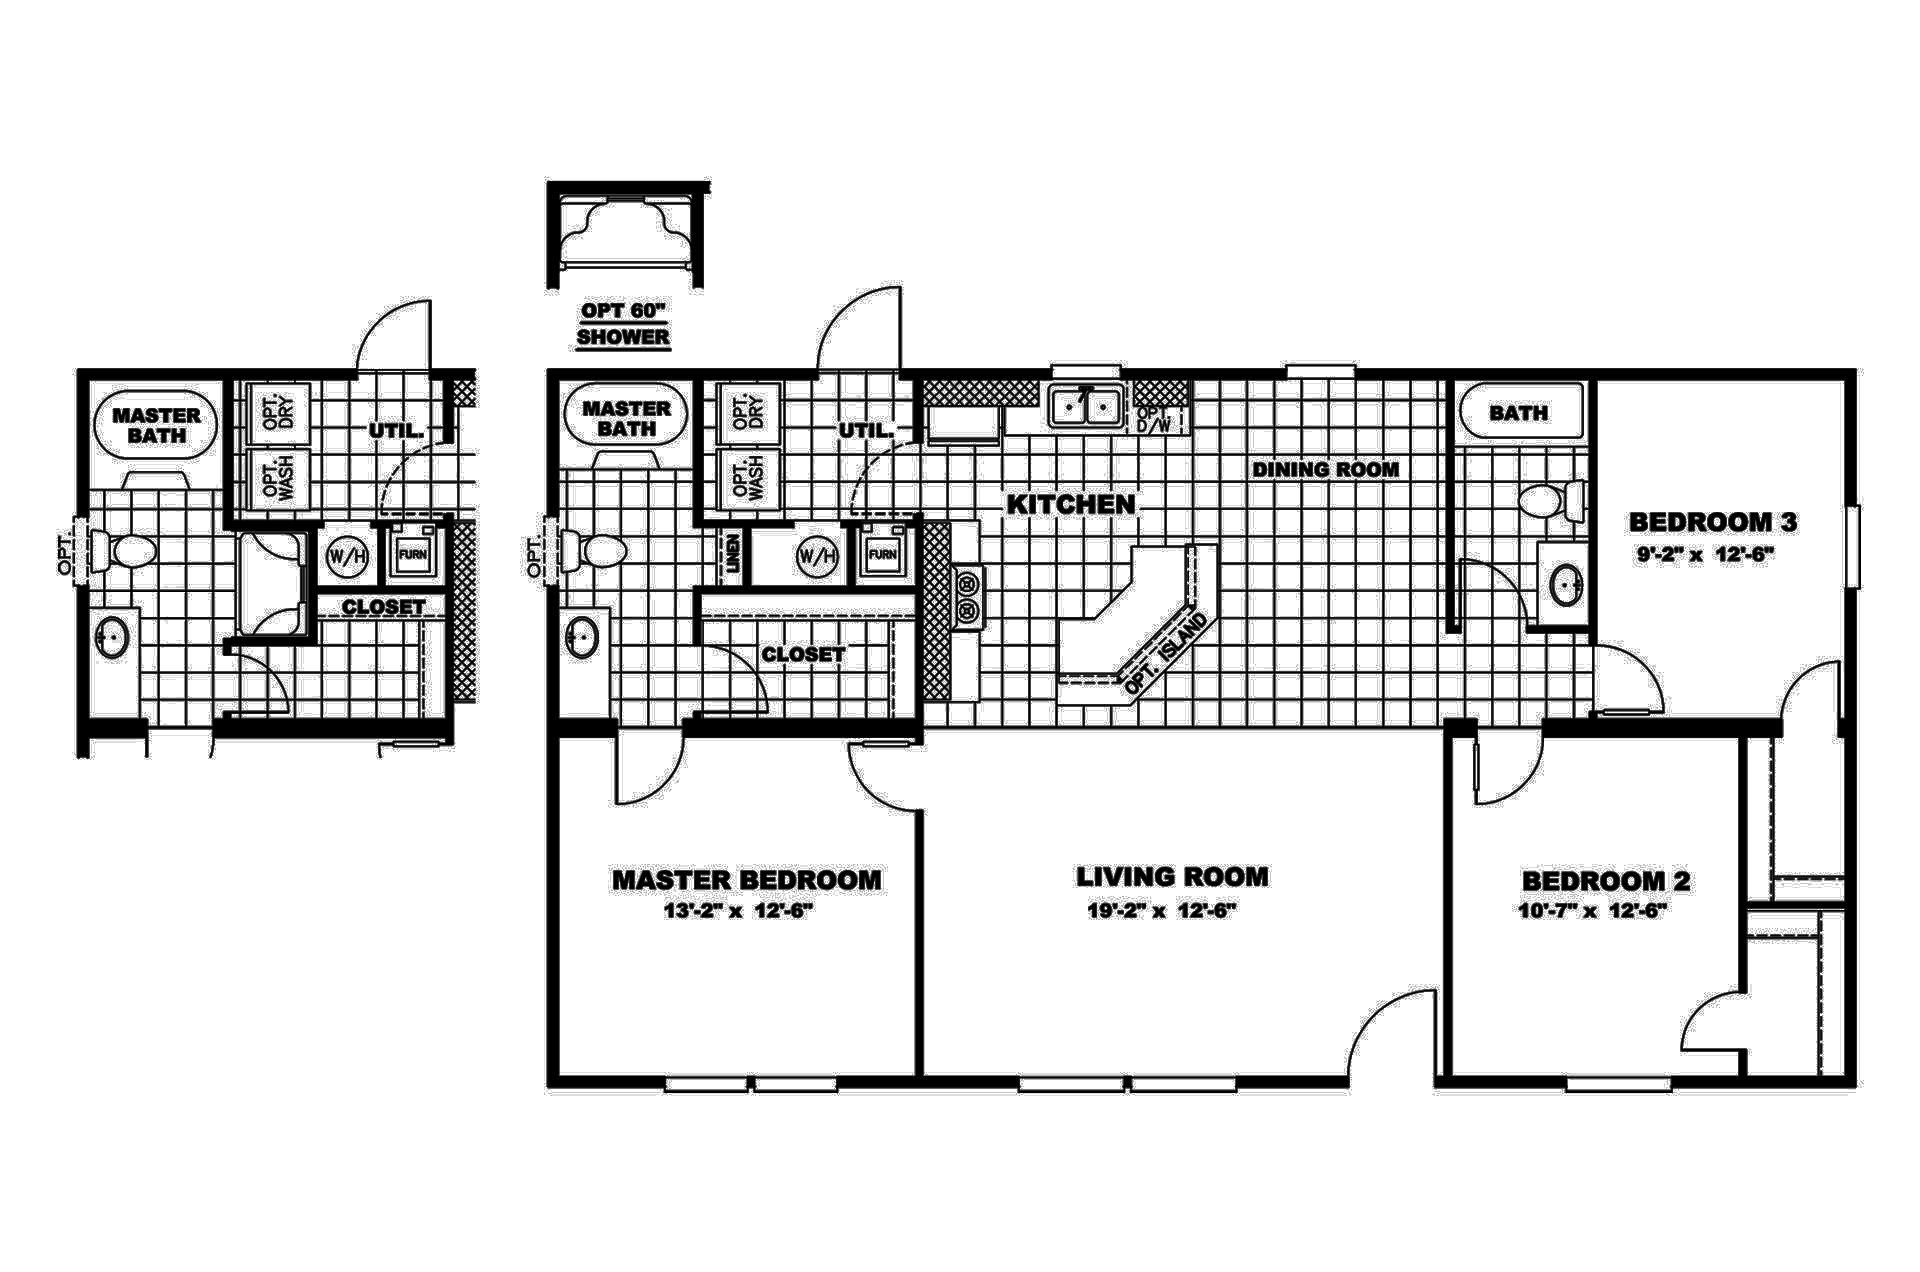 Factory Direct - The Benjamin